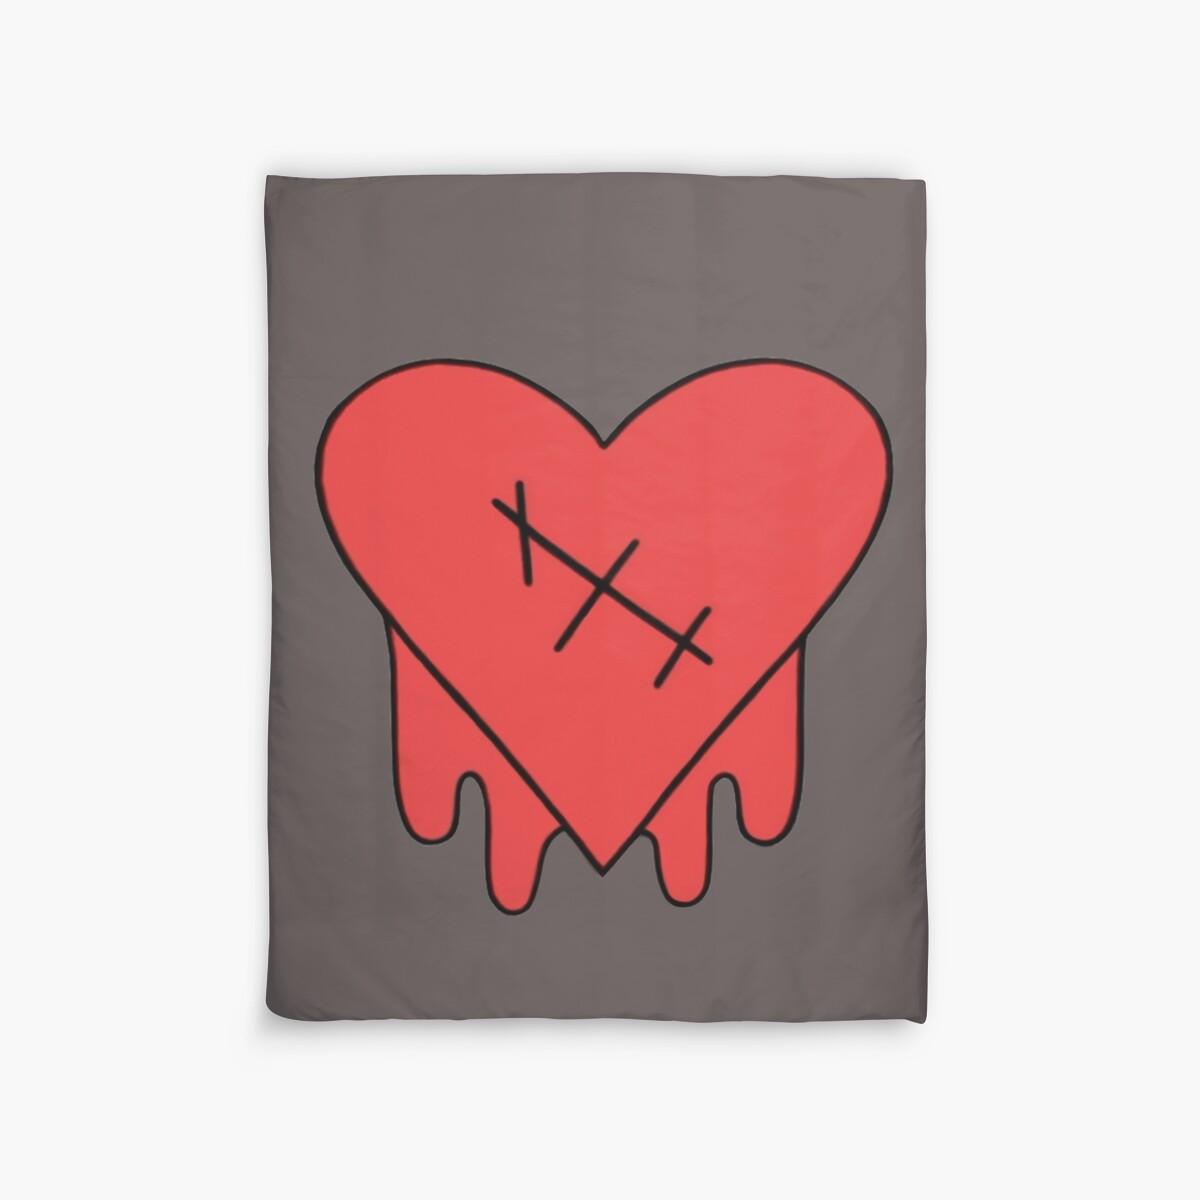 Quot Gravity Falls Robbie V S Edgy On Purpose Heart Quot Duvet